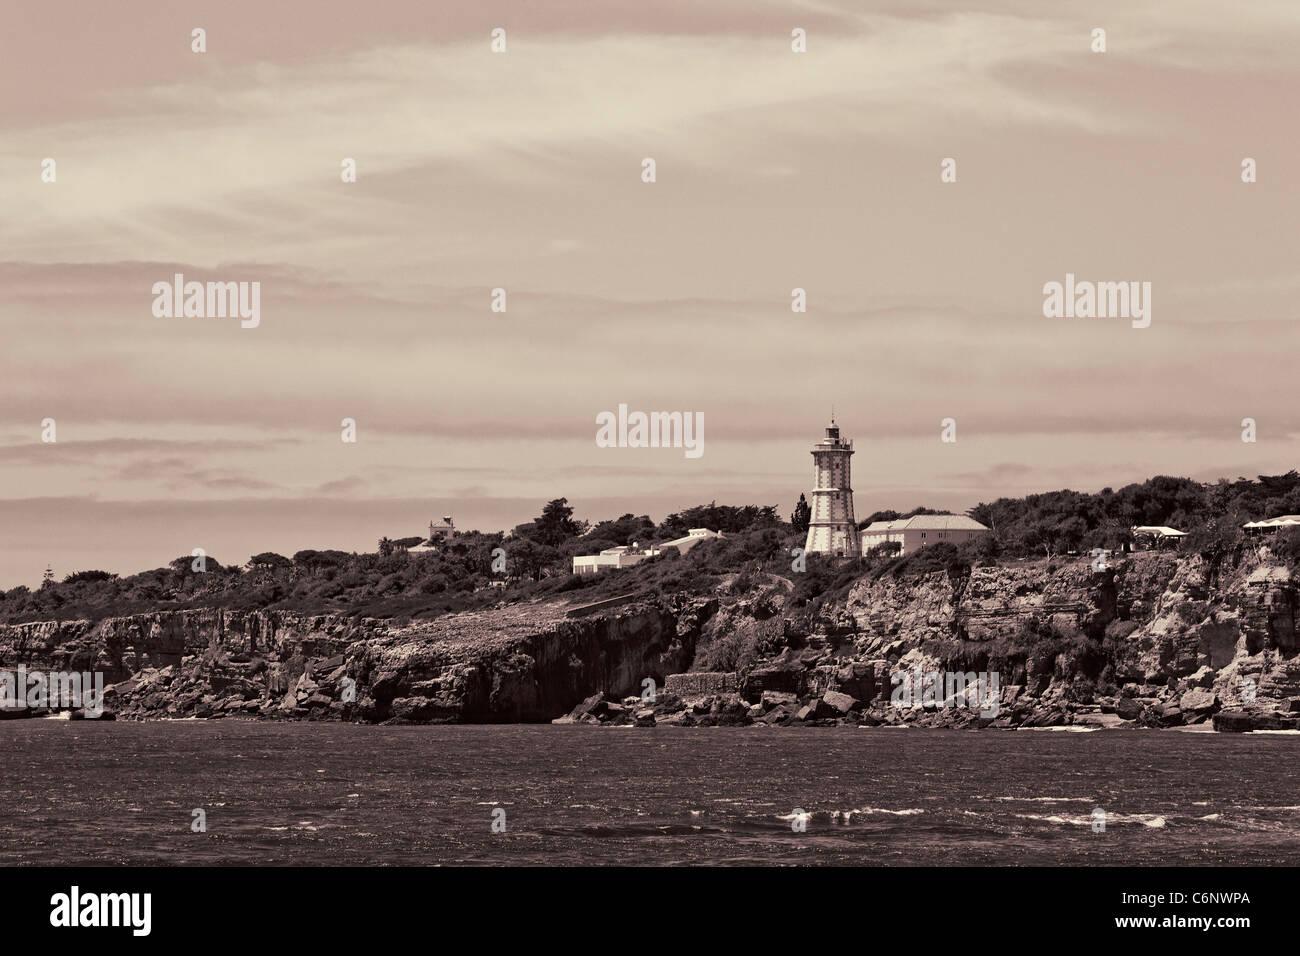 Light tower at shore near charm Boca do Inferno located close to the Portuguese city of Cascais. Stock Photo